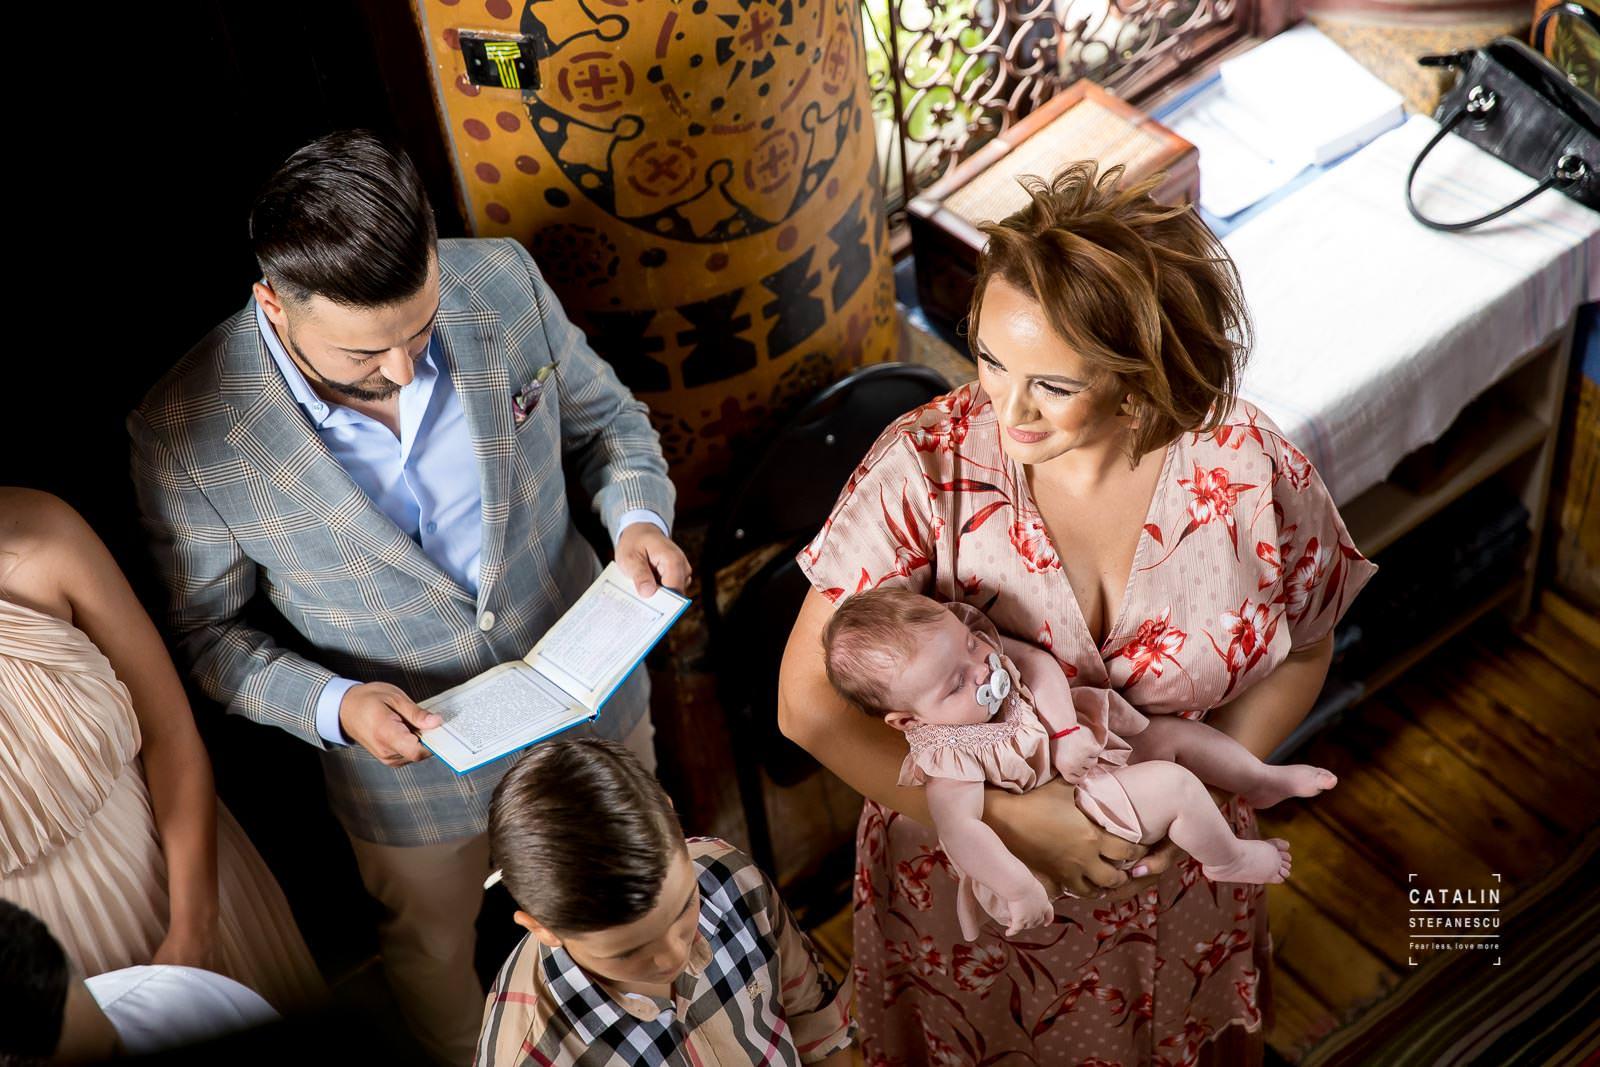 Fotografi Botez Bucuresti - Botez Iris Maria - Fotograf Profesionist Botez Bucuresti Catalin Stefanescu